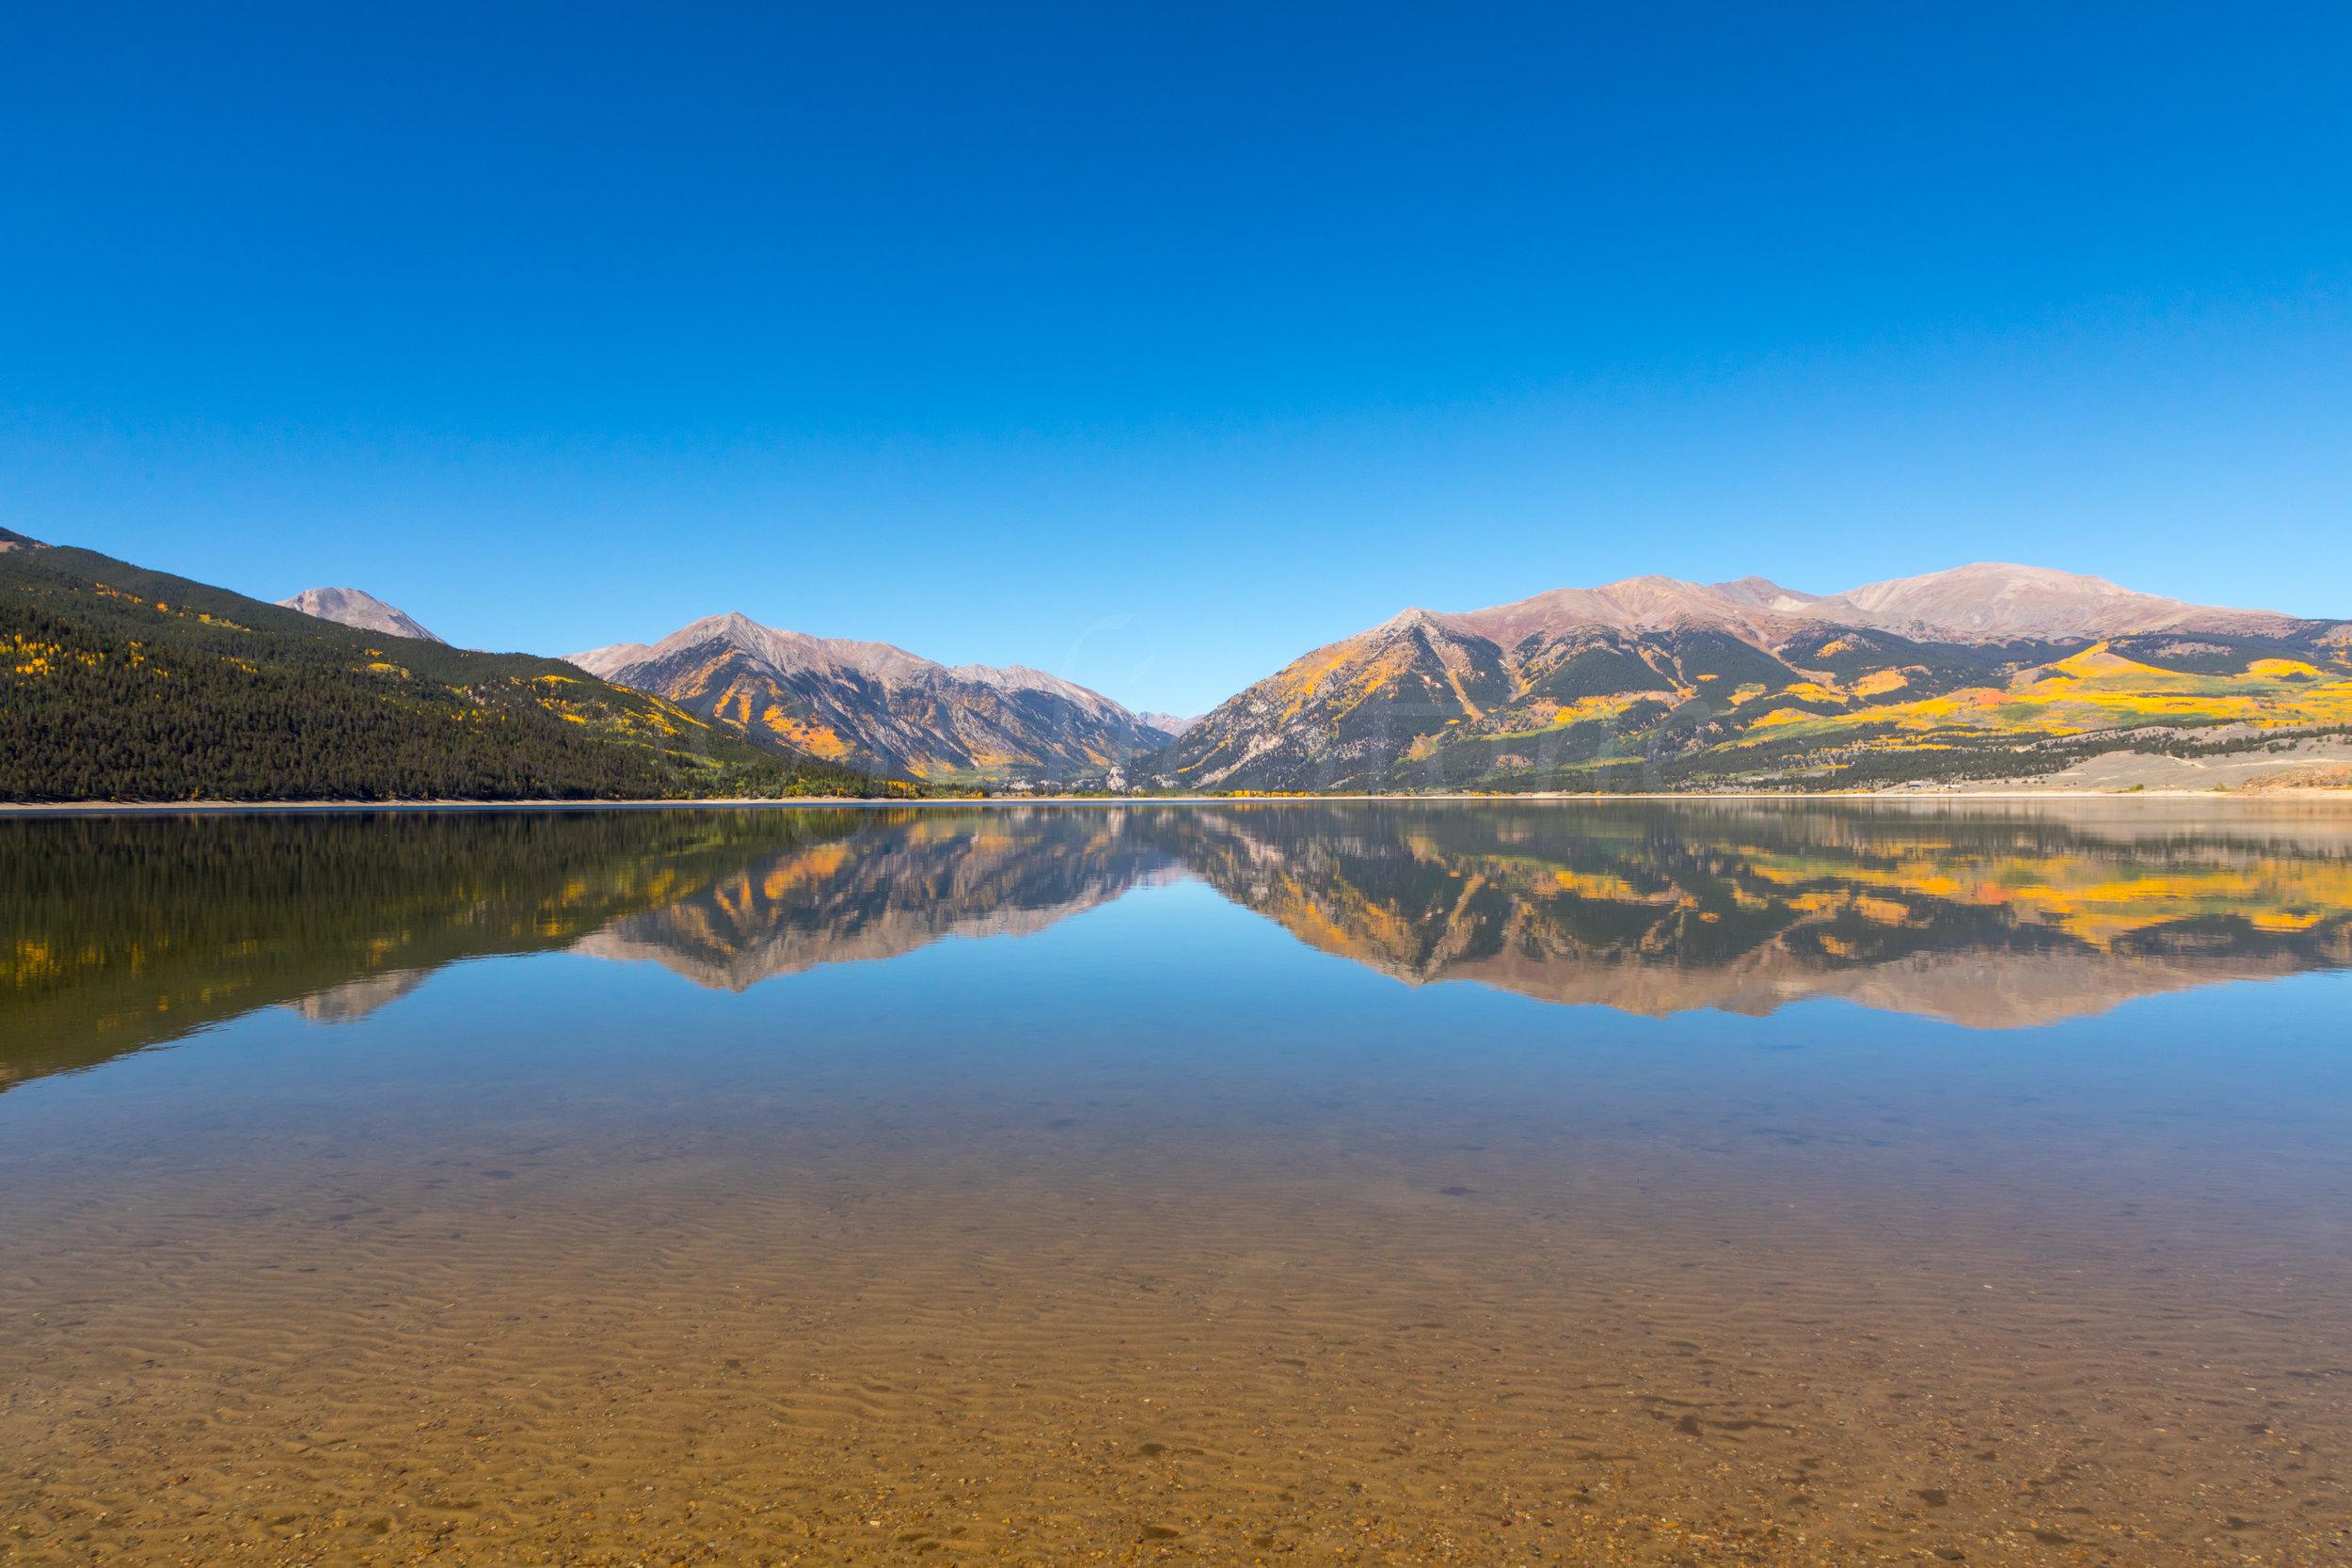 Twin Lakes, Image # 0455